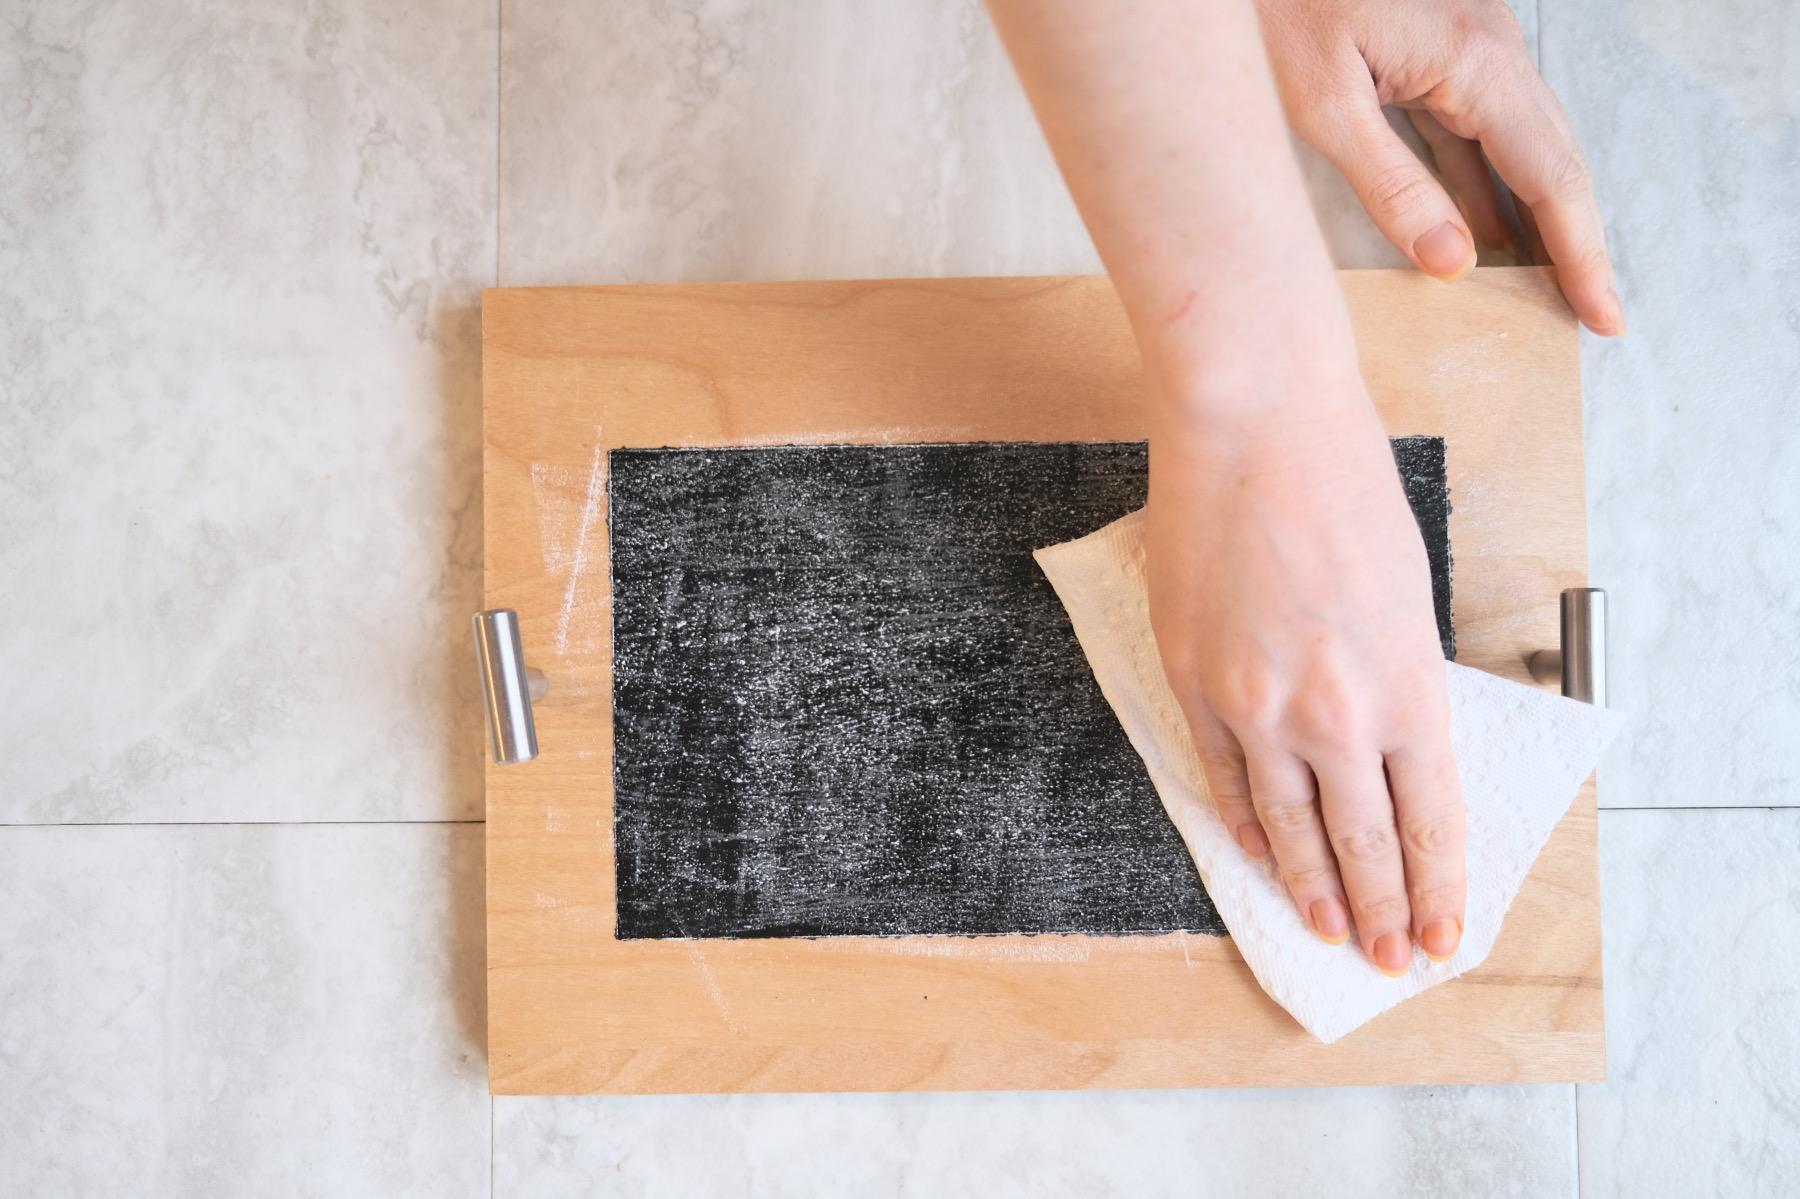 wipe off the dry chalk to season a chalkboard